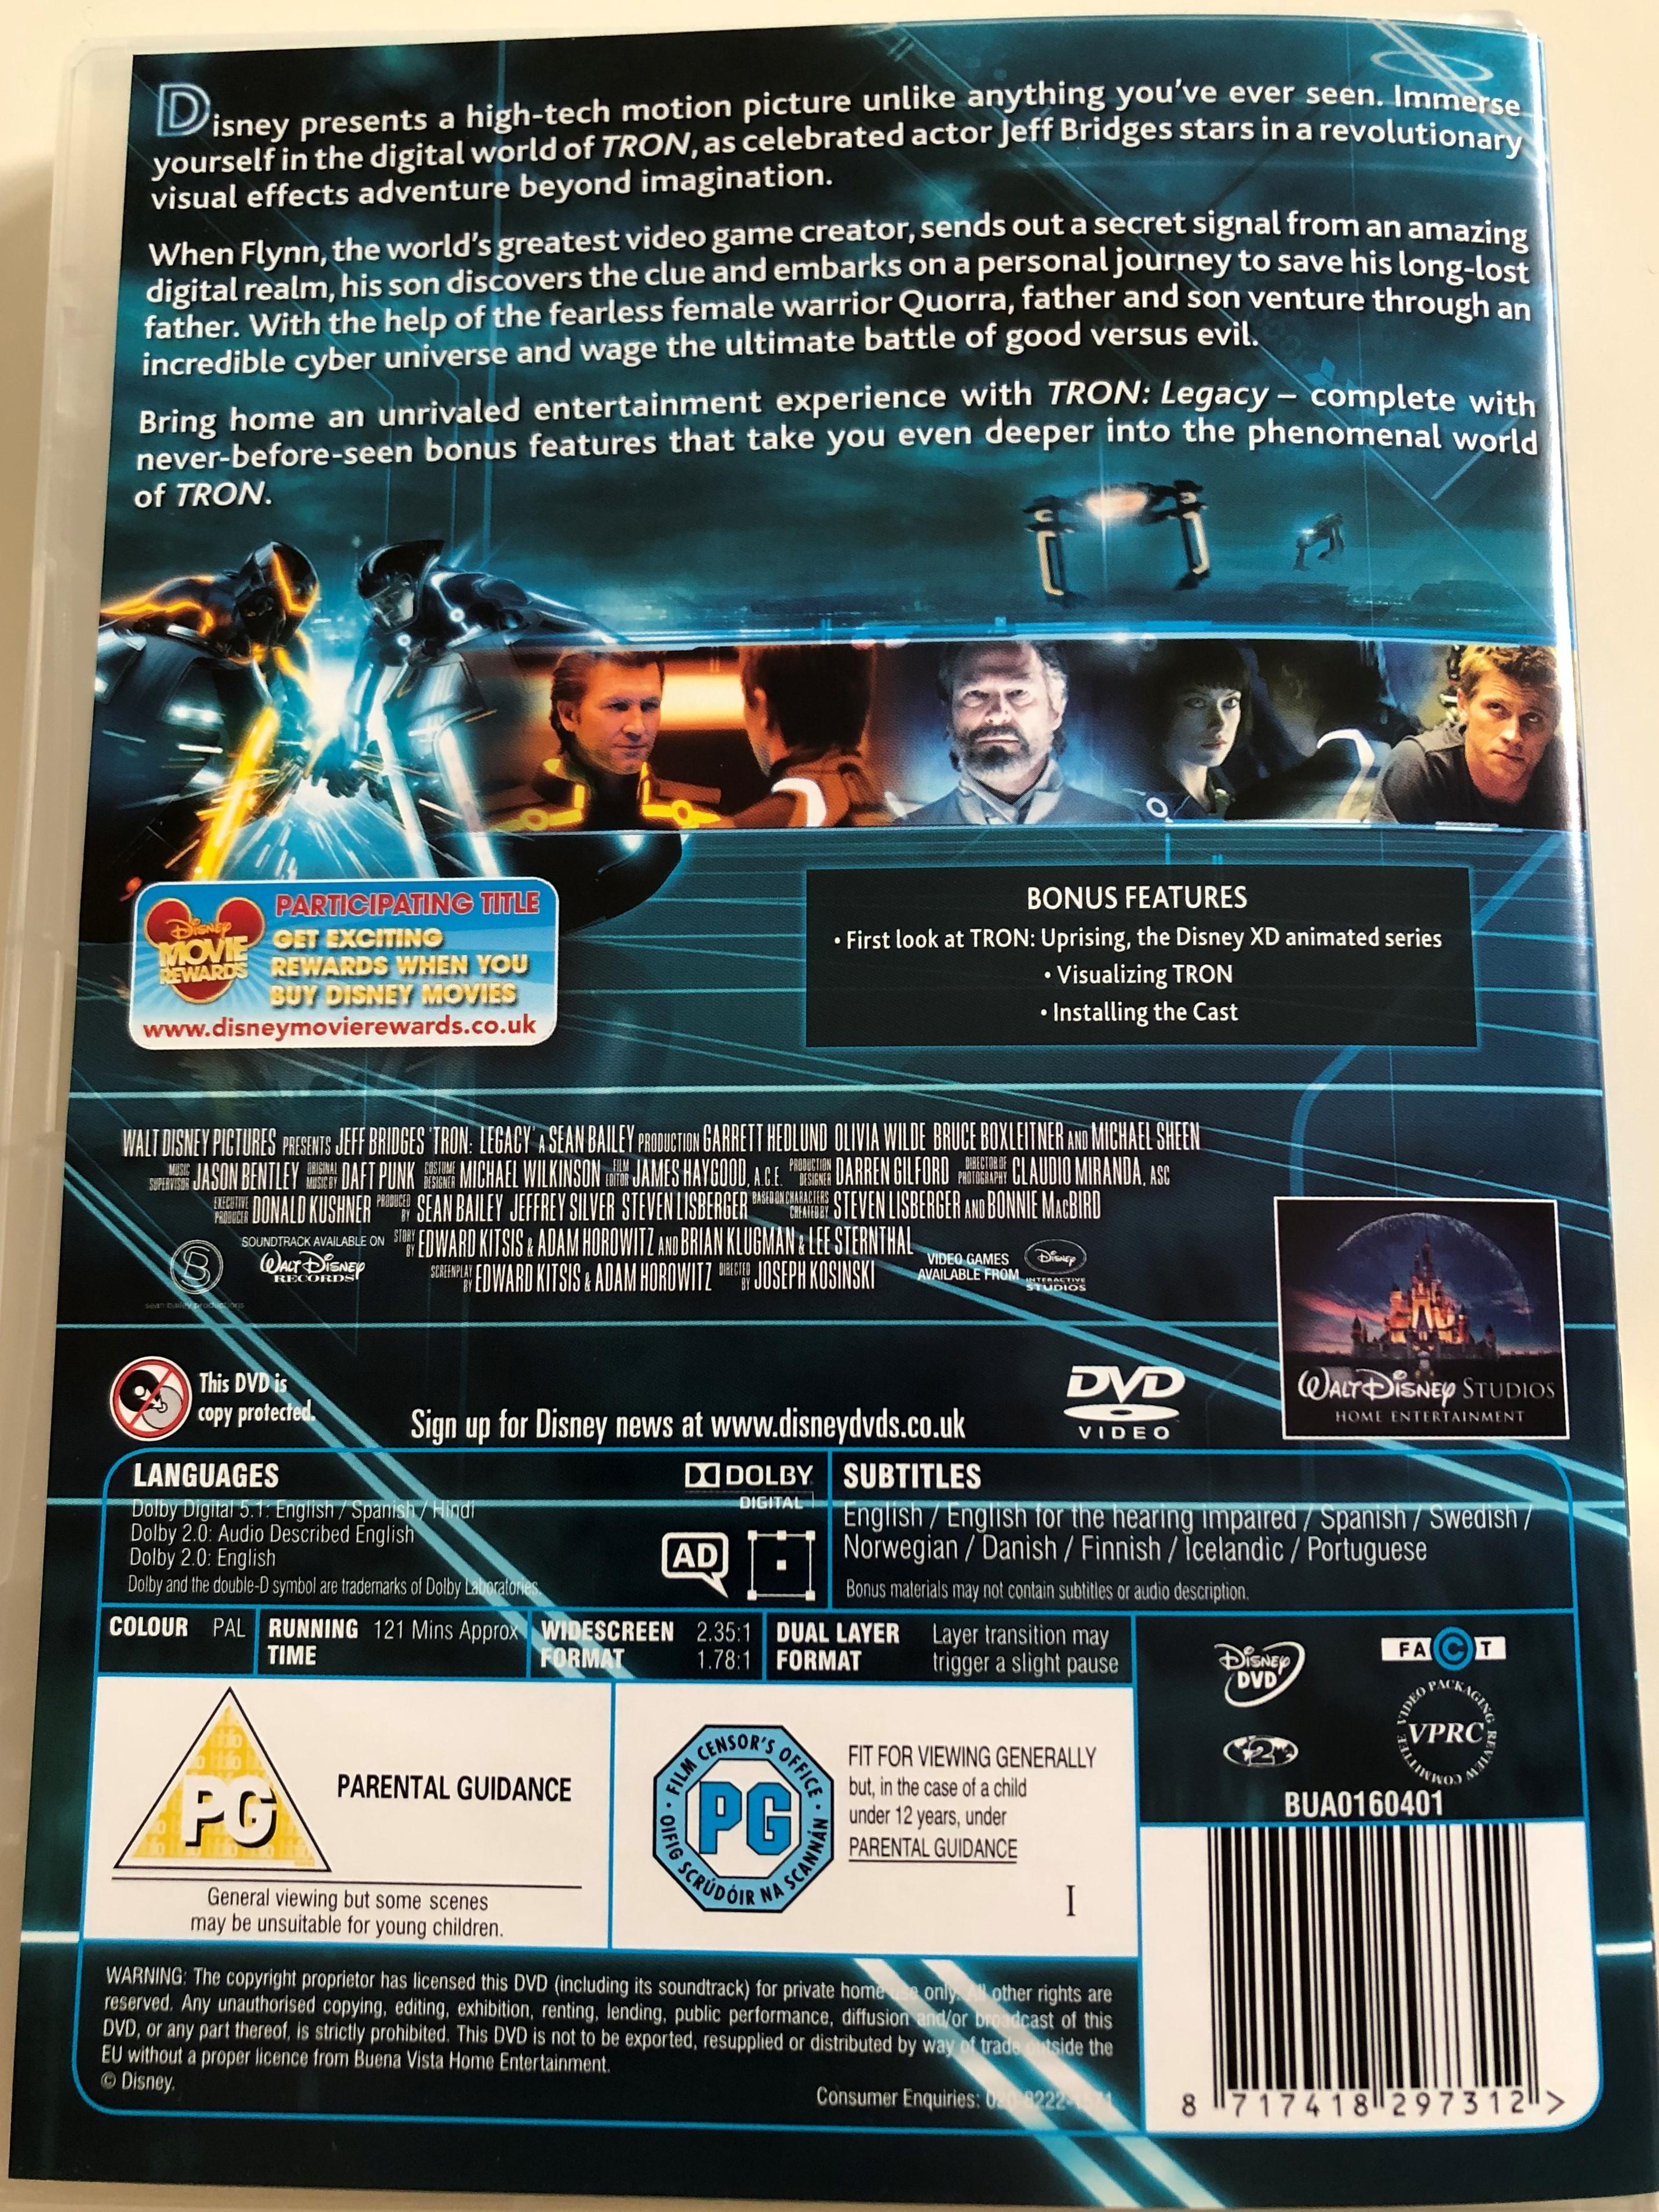 tron-legacy-dvd-2010-directed-by-joseph-kosinski-2.jpg